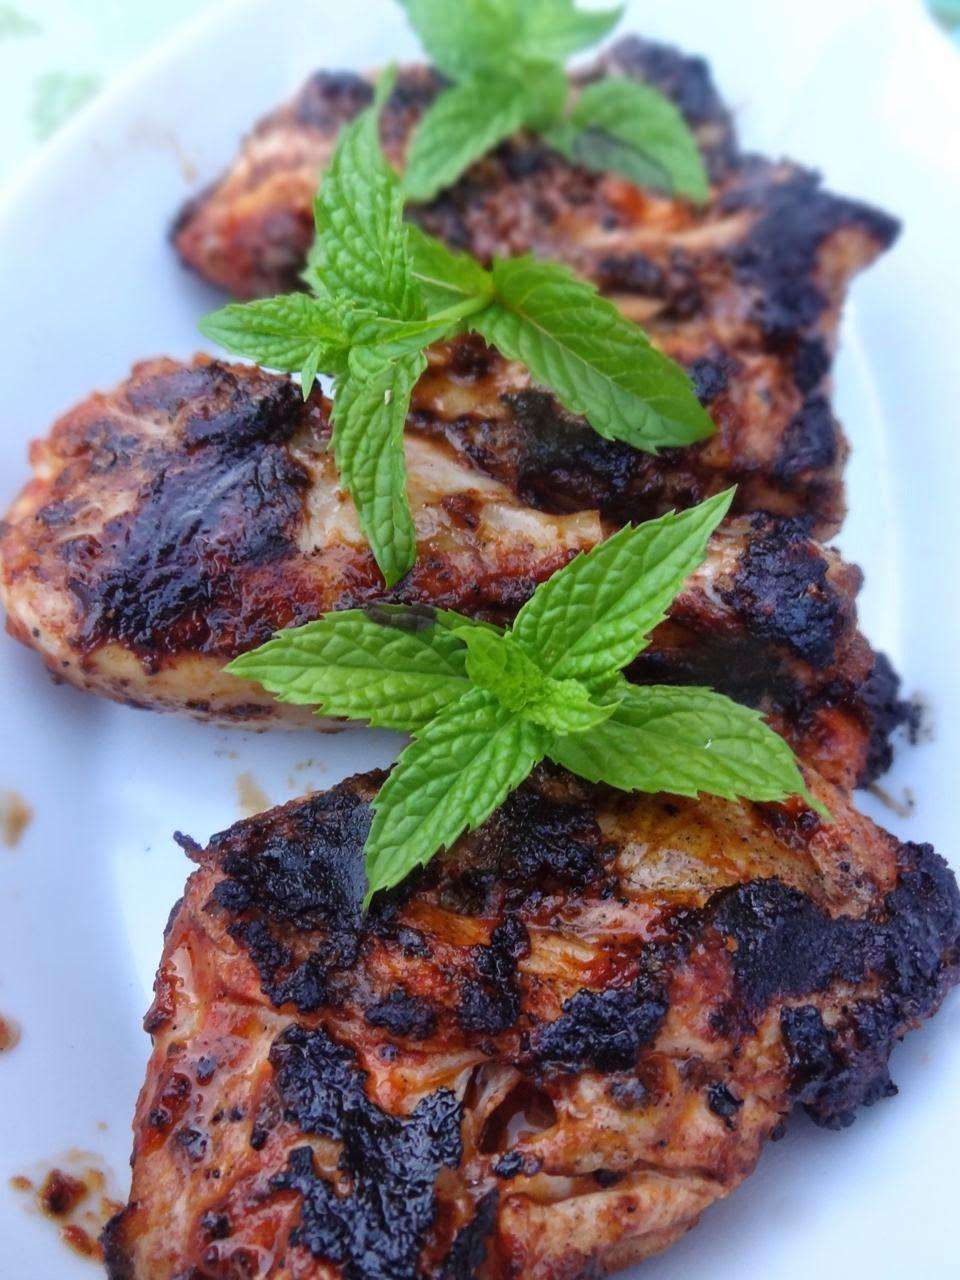 Scrumpdillyicious: Piri-Piri Chicken with Pan-Fried Parmesan Polenta